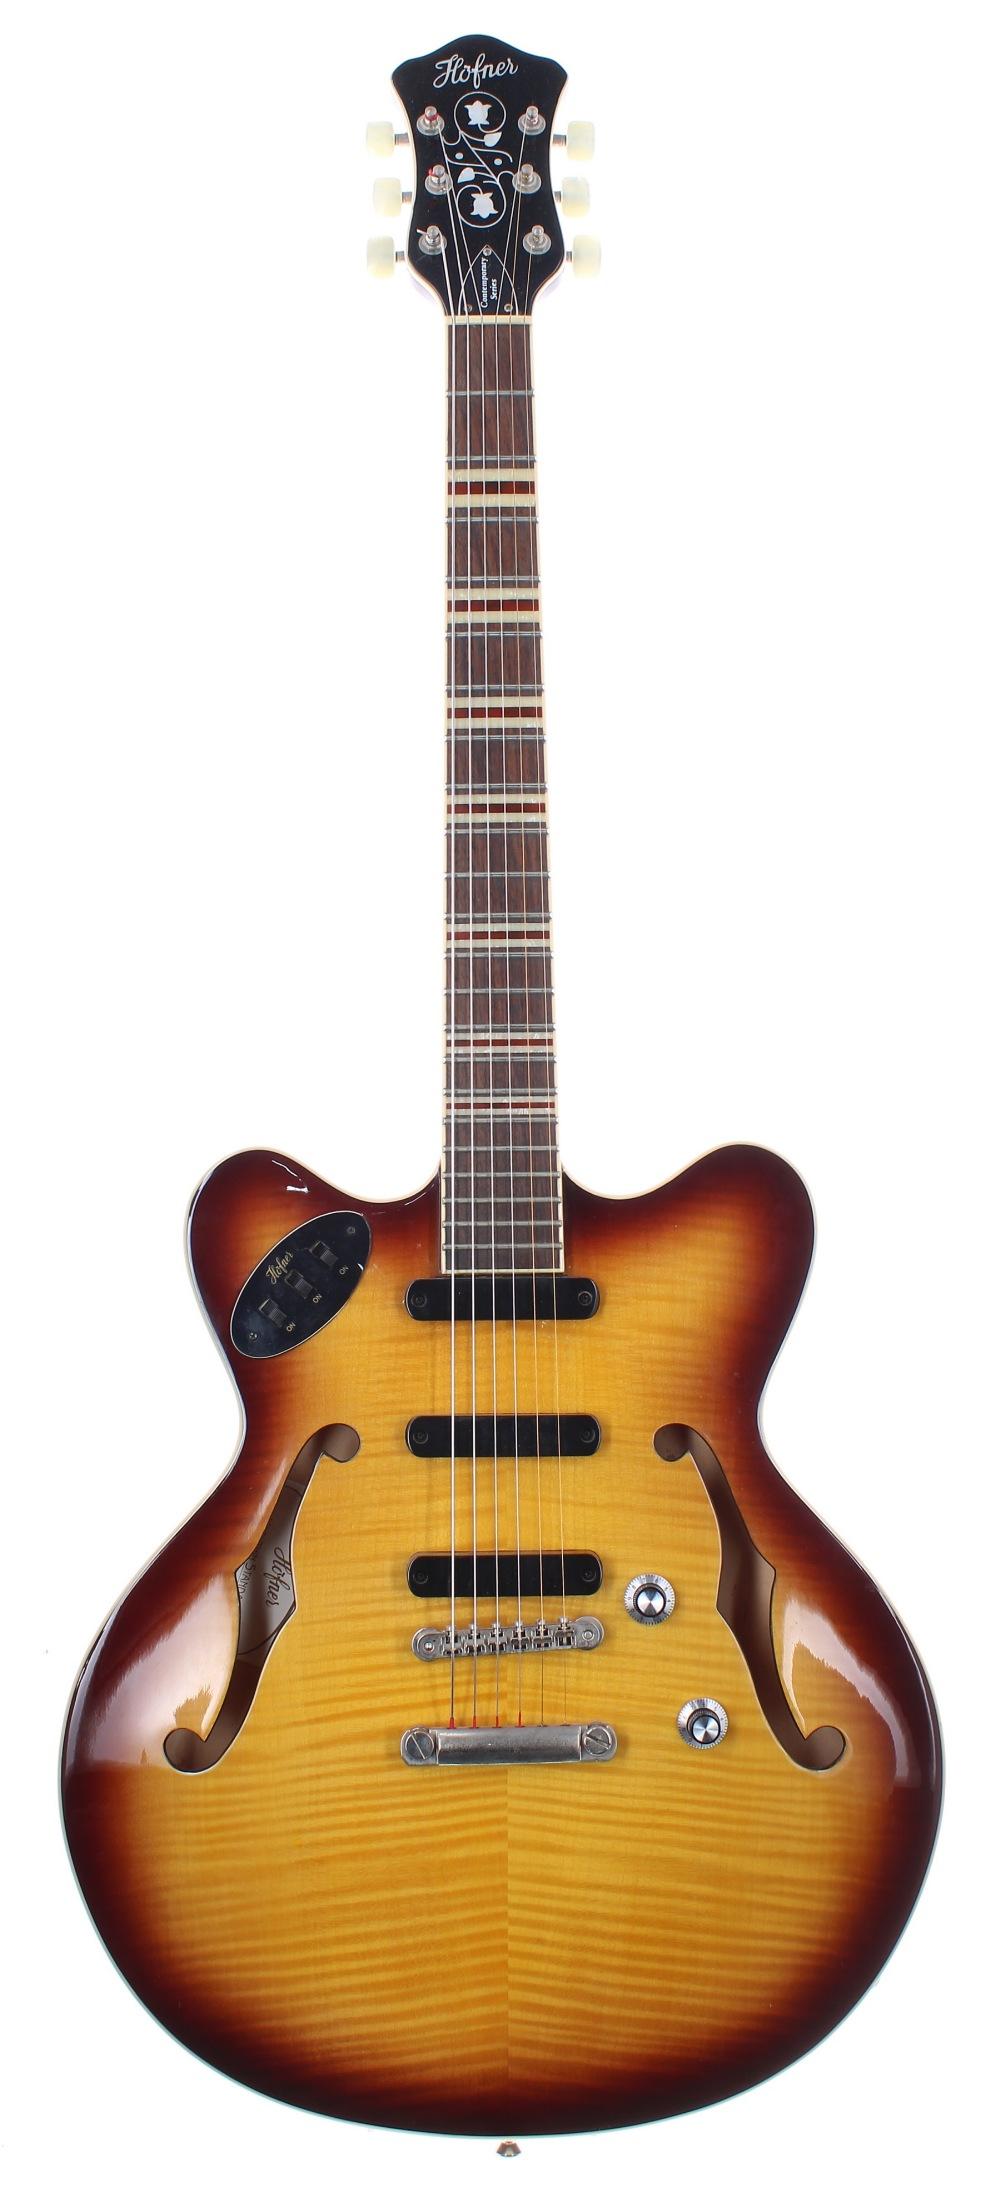 Hofner Verythin Standard-CT semi-hollow body electric guitar, ser. no. M0xxxxx12; Finish: